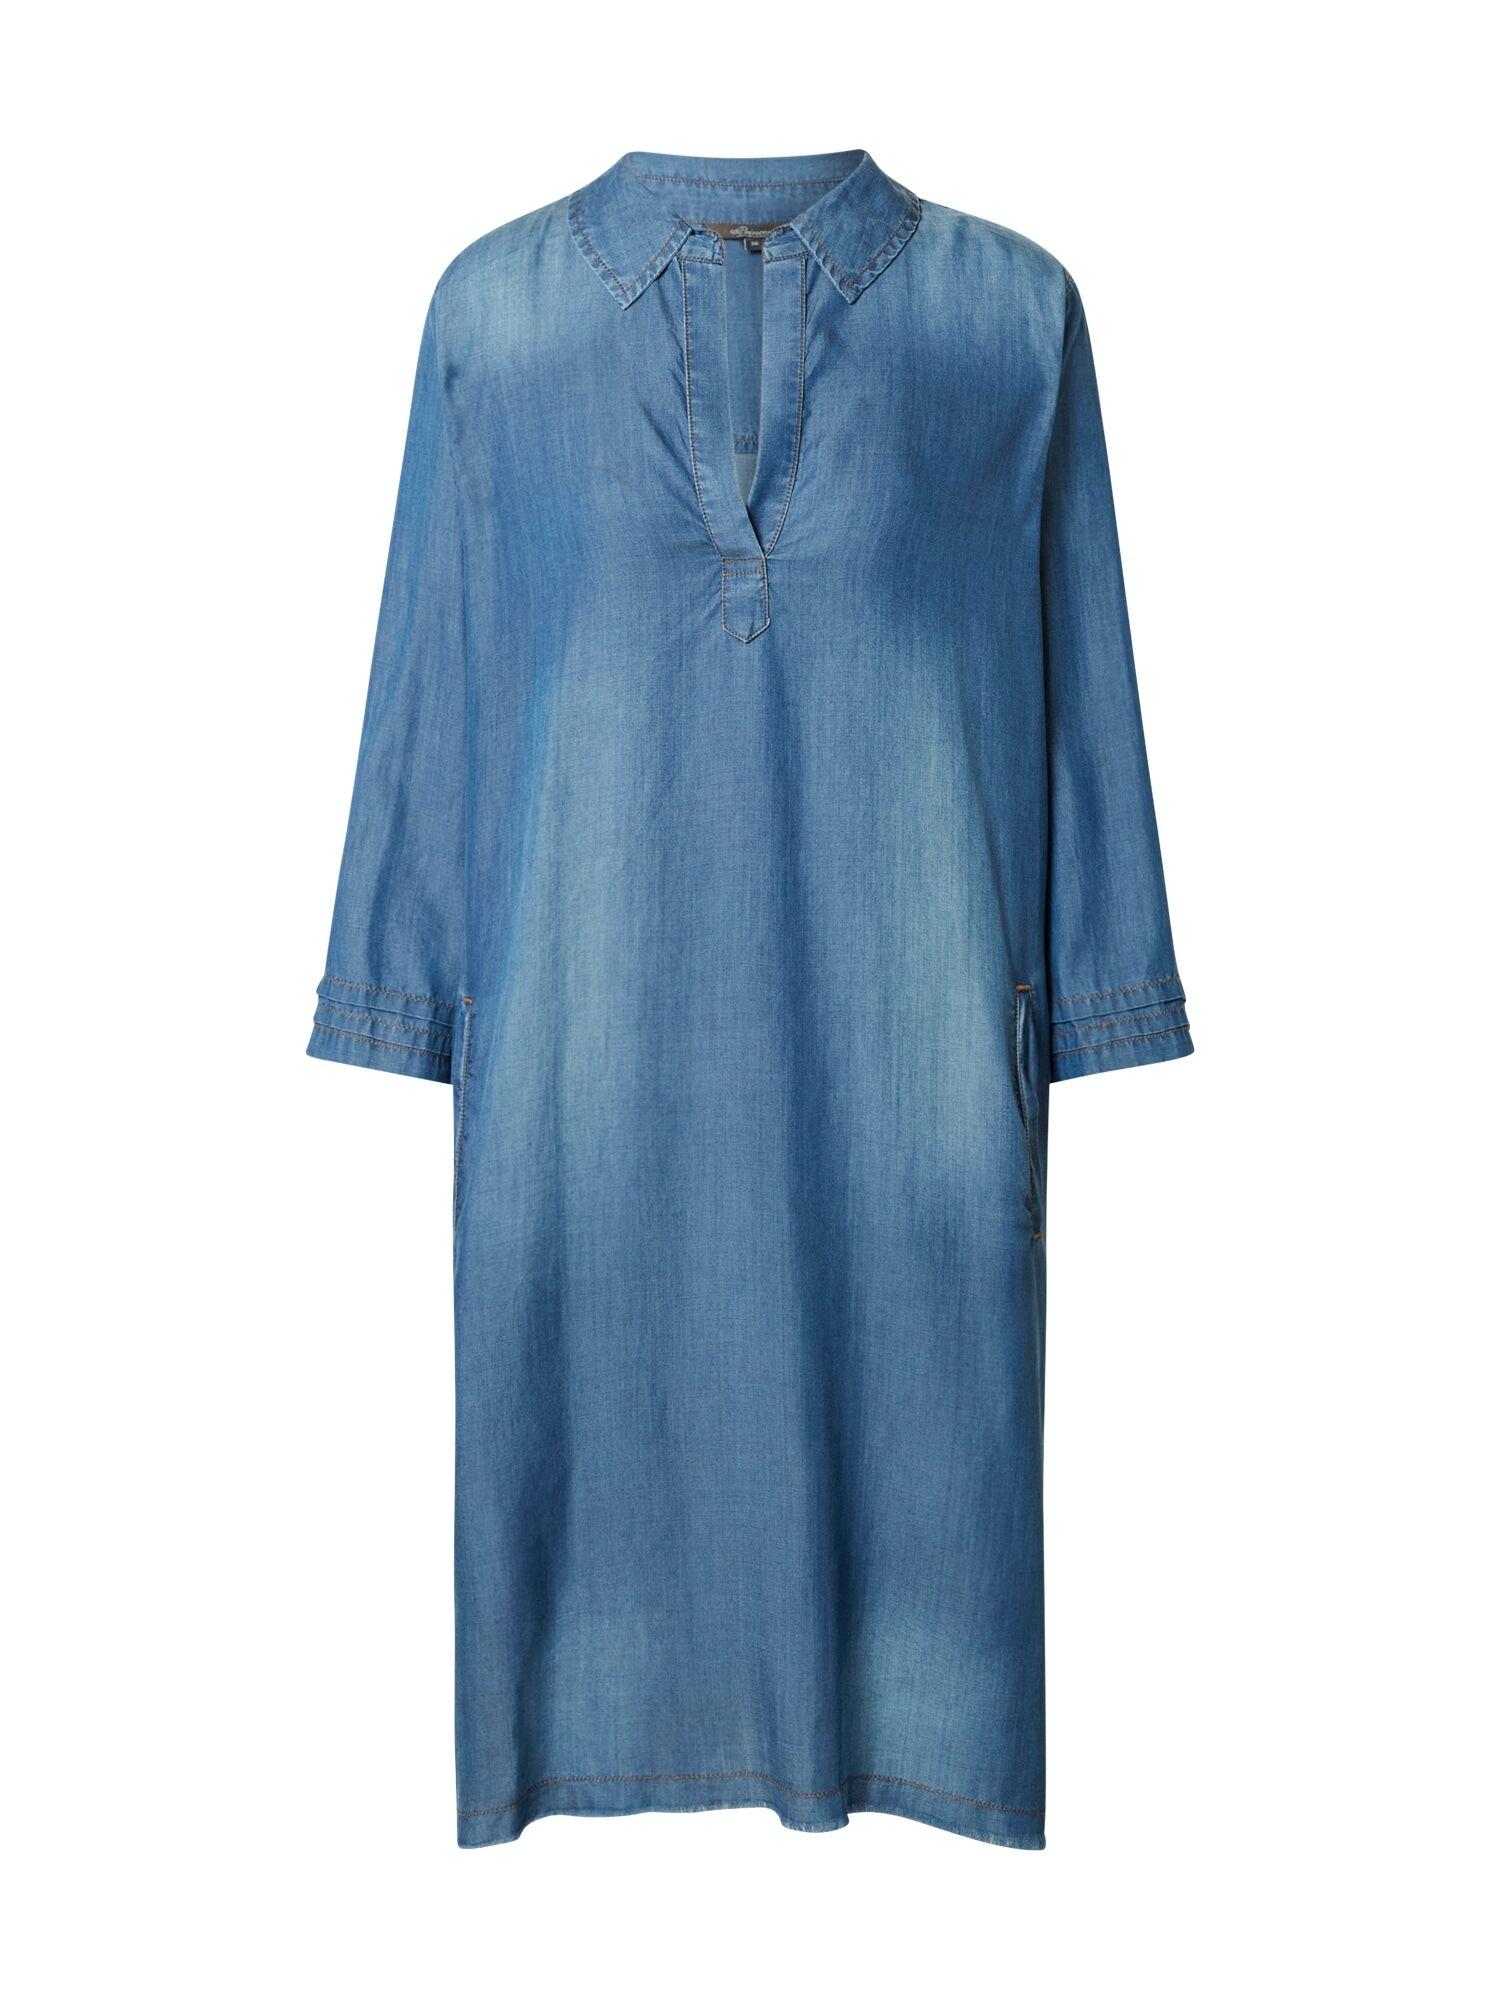 Princess Robe  - Bleu - Taille: 40 - female